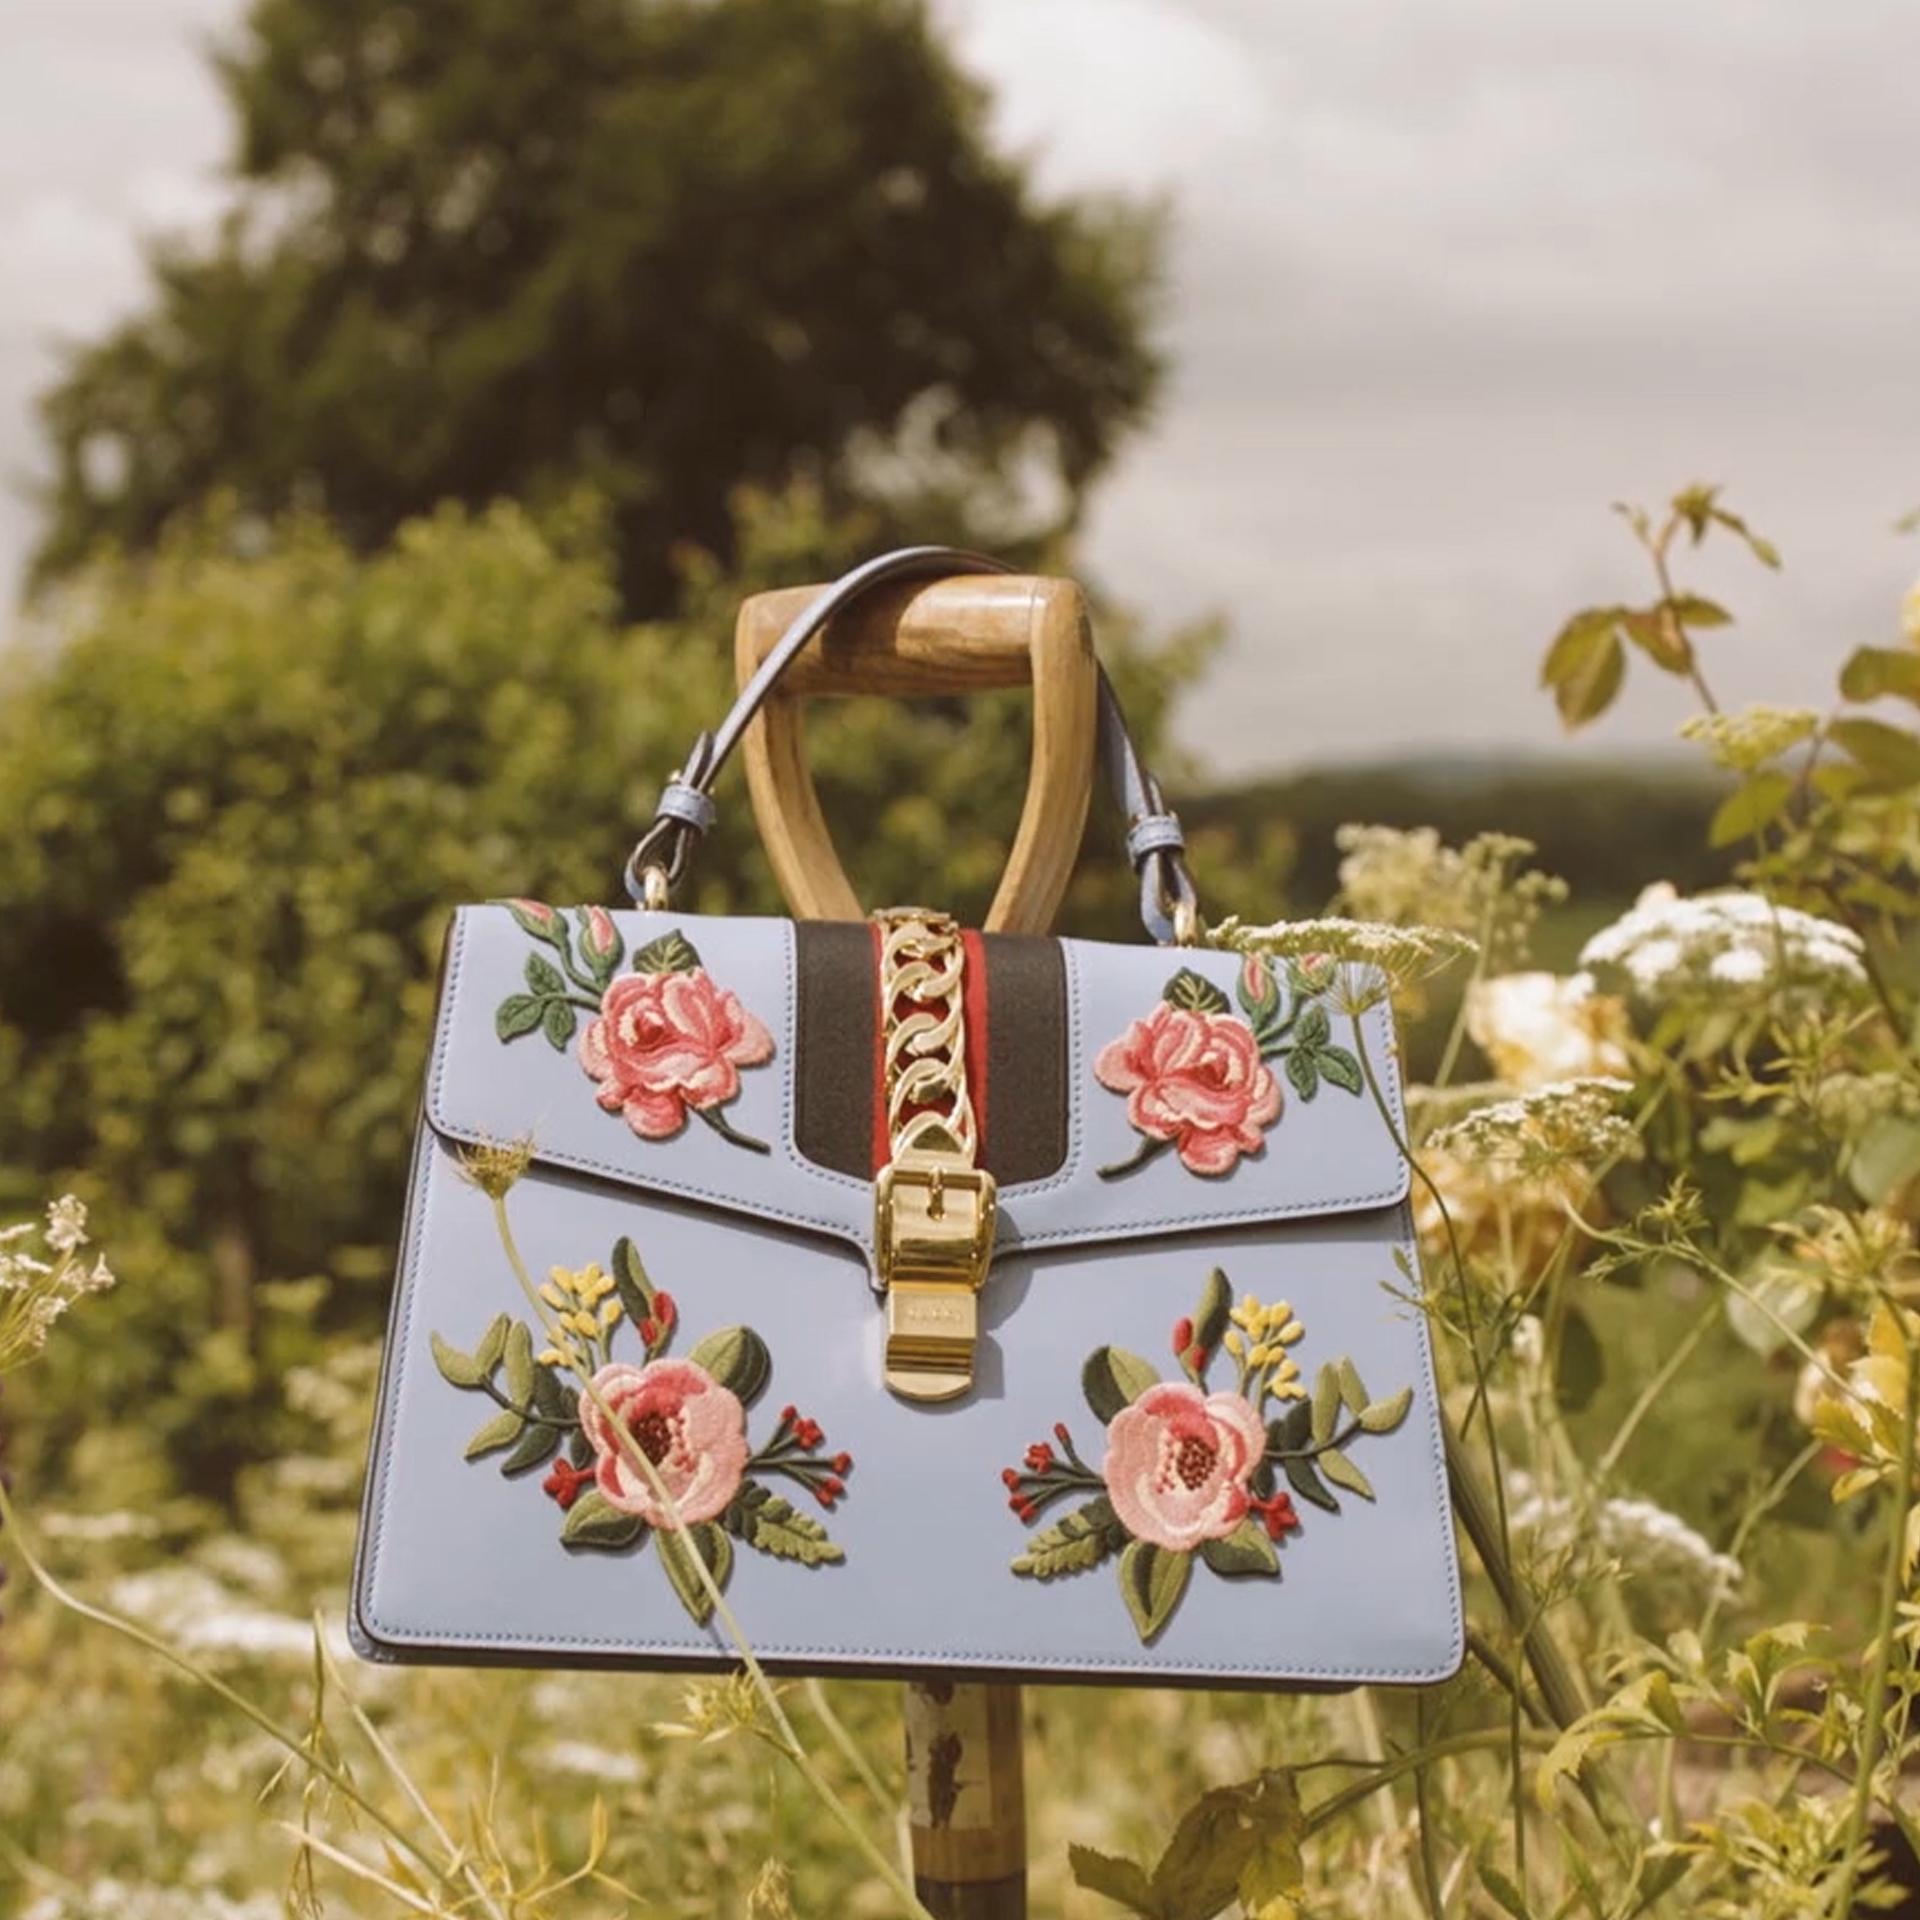 Photo of Gucci handbag in open field